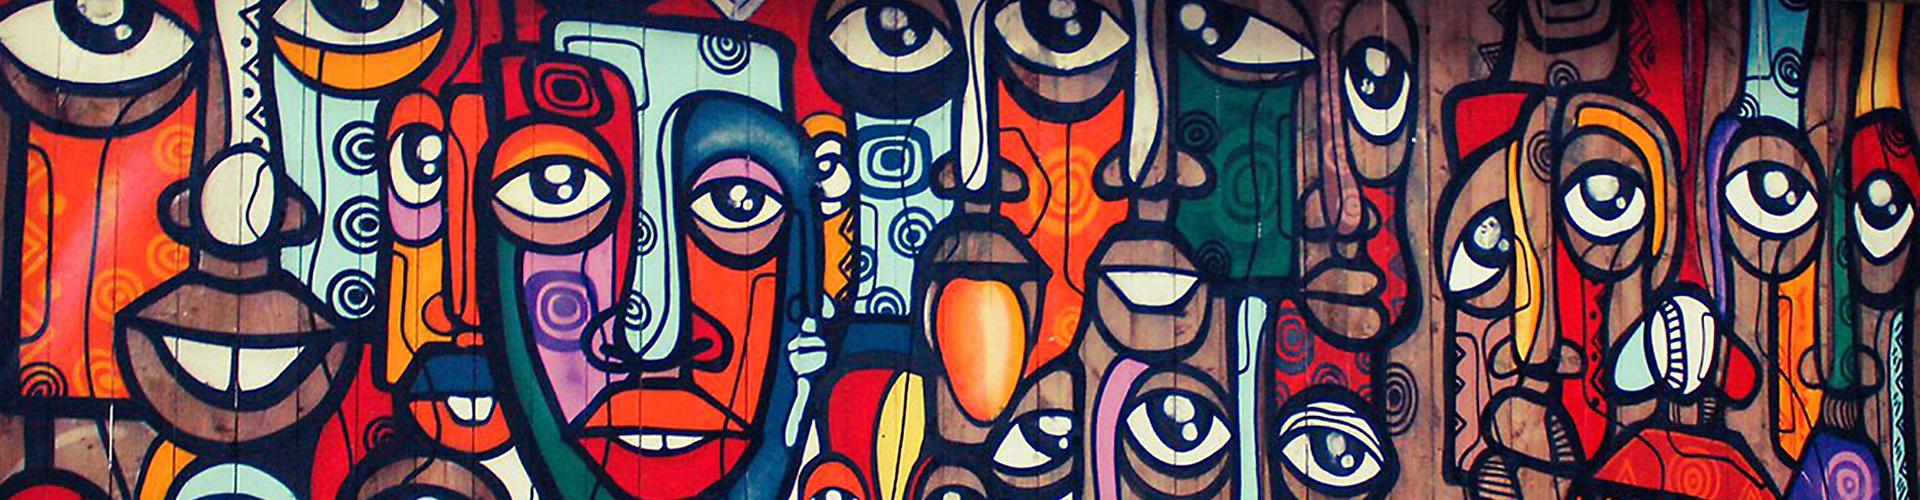 London: Arts